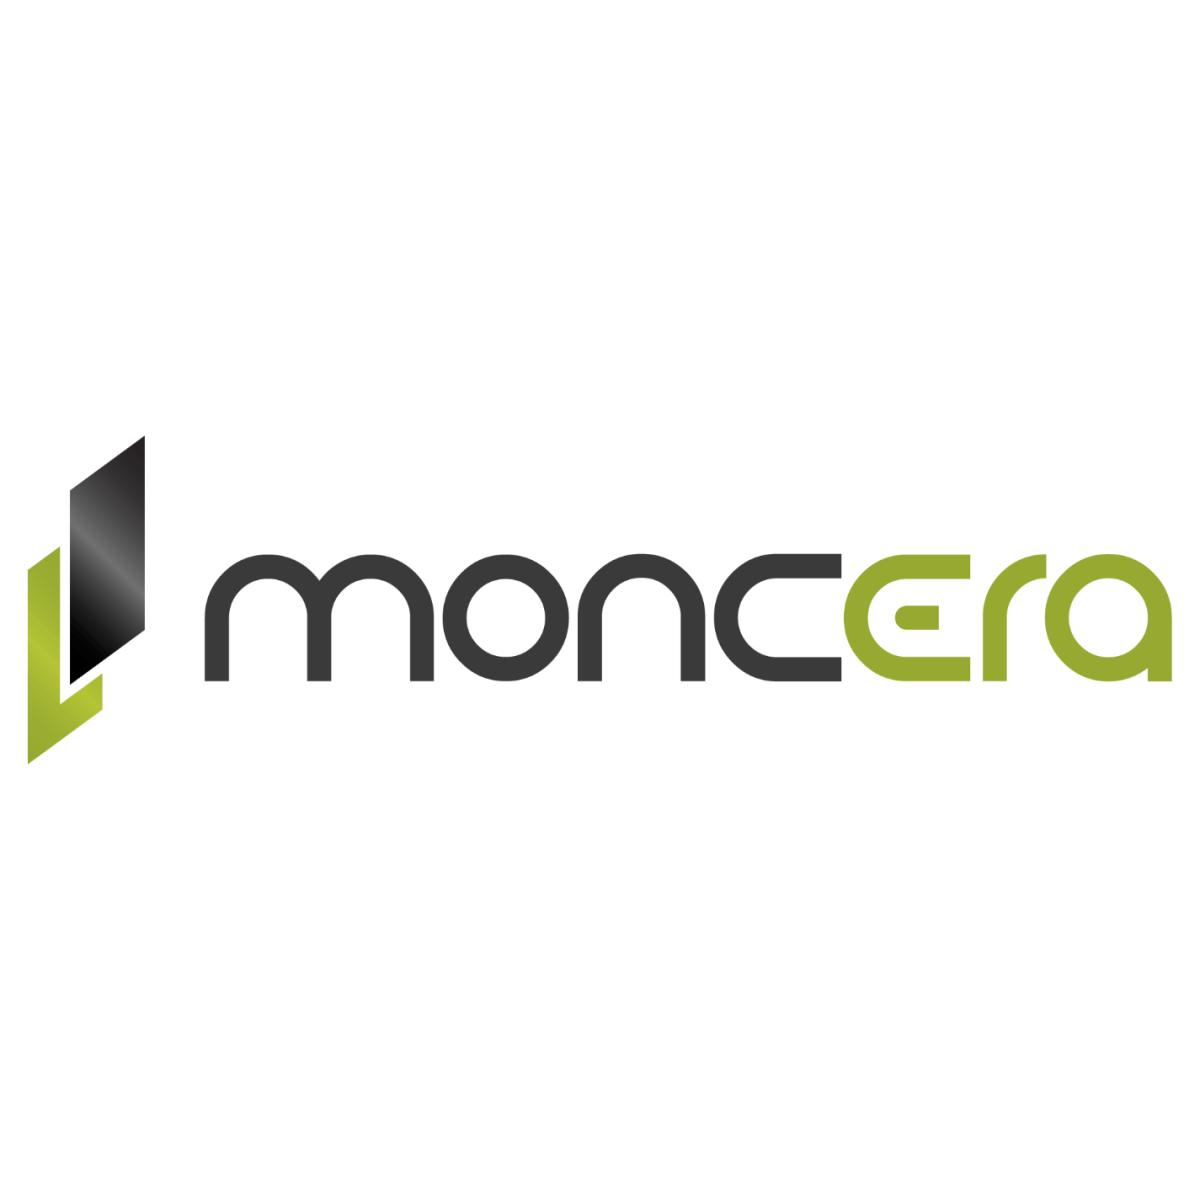 S4F Moncera Logotipo @ SavingsForFreedom